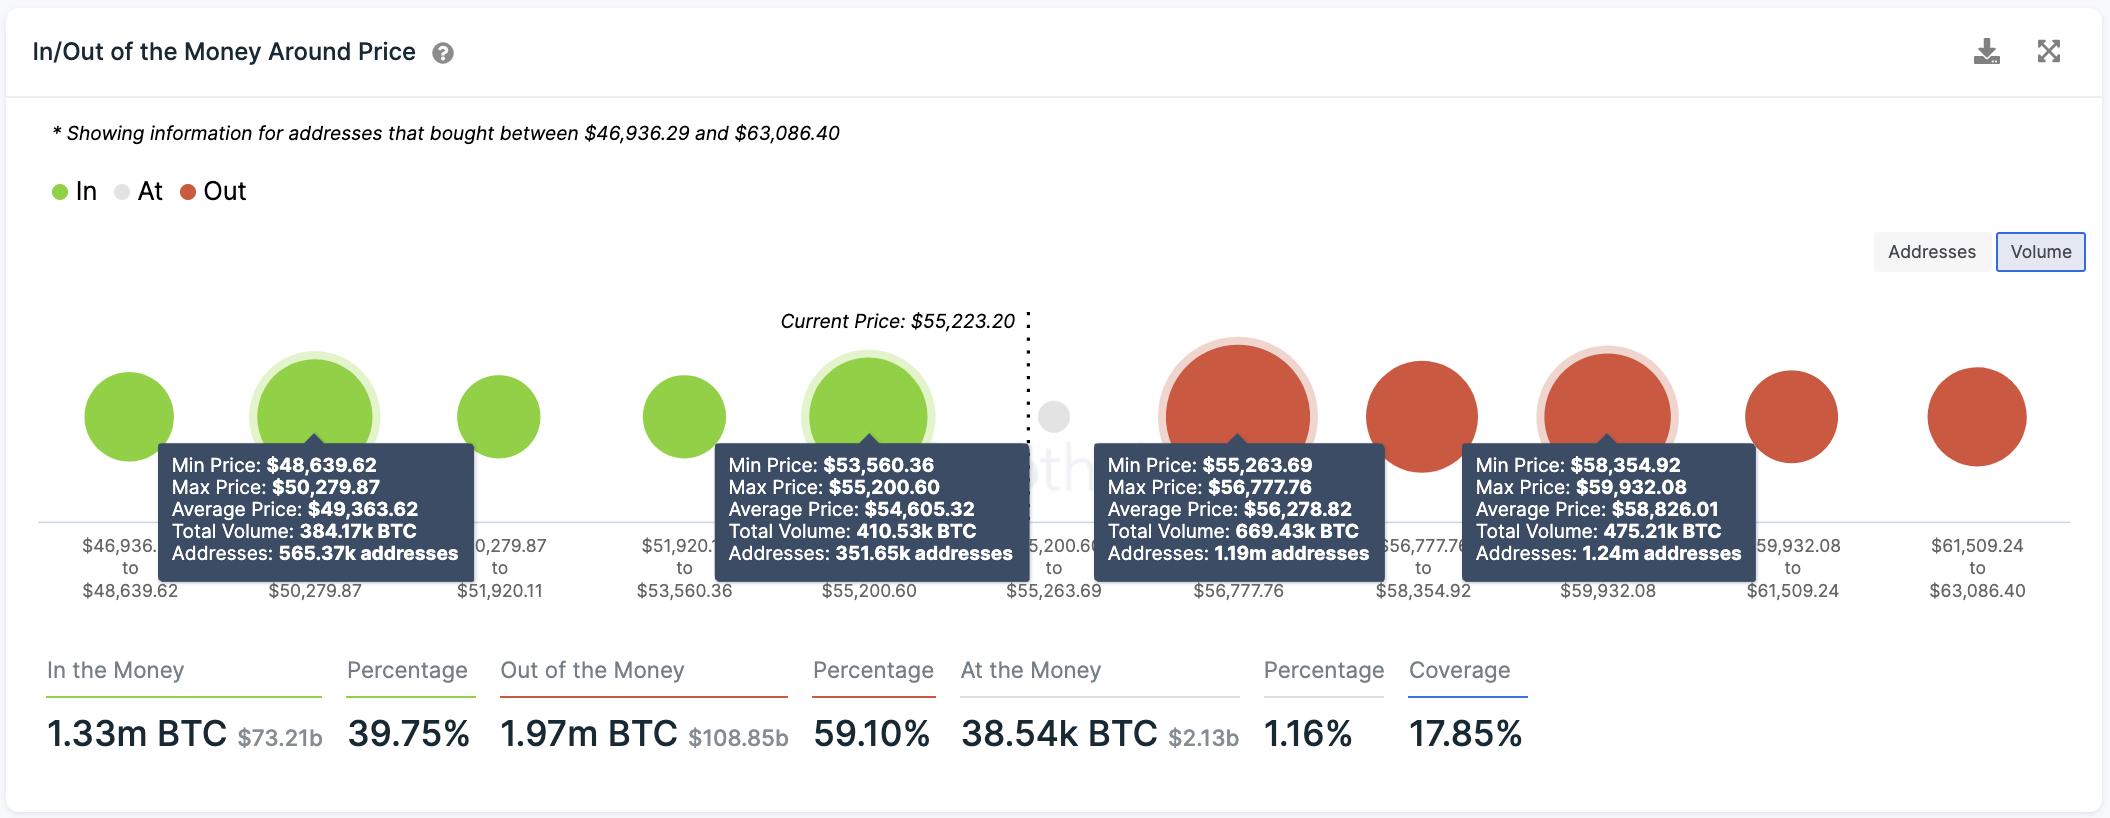 In / Out of the Money Around Price av IntoTheBlock